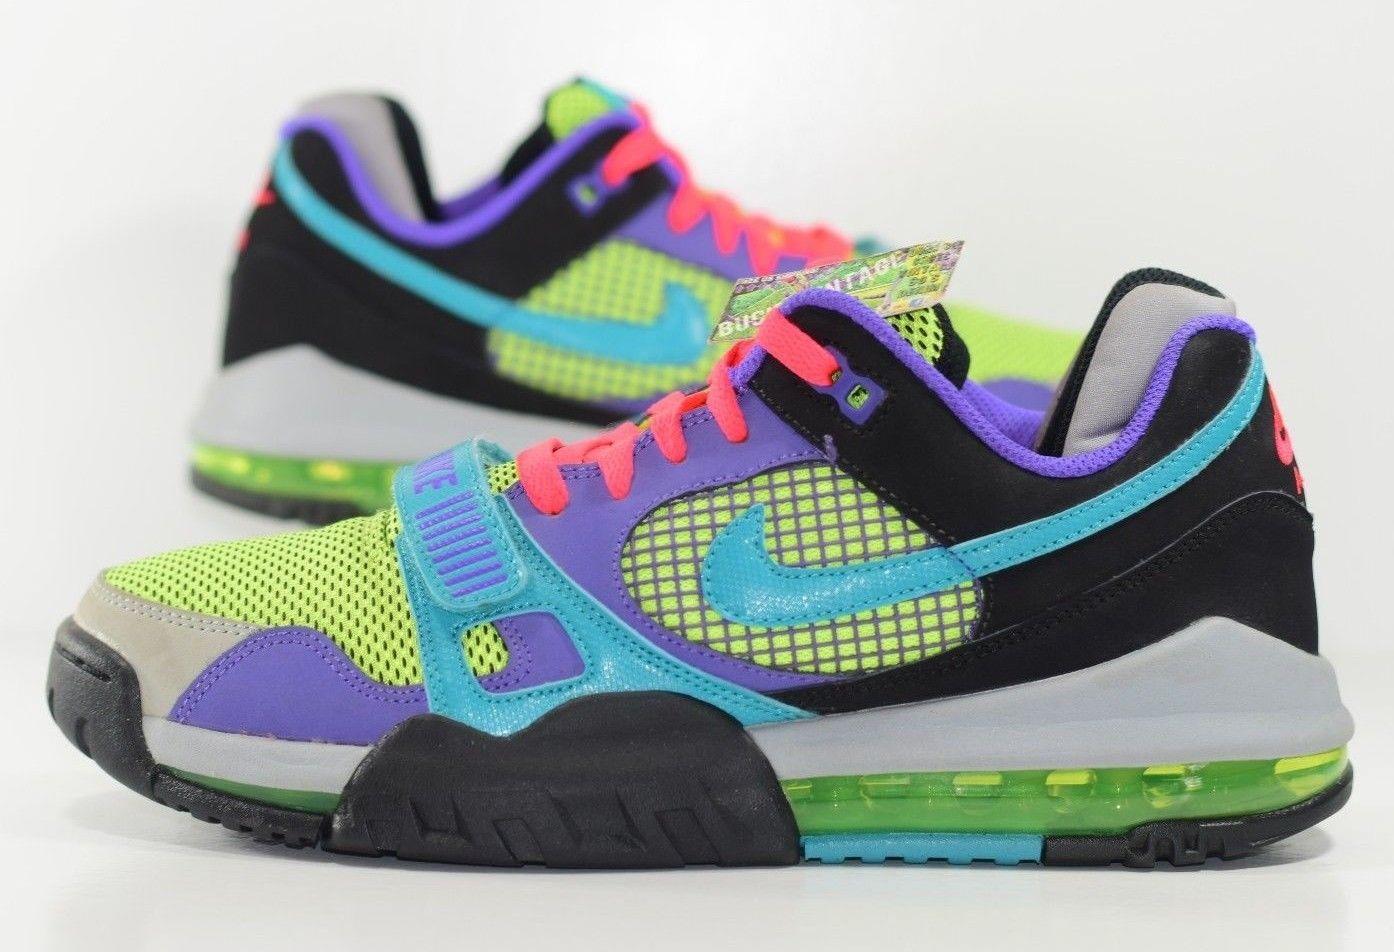 Size 9 | 2013 Nike Air Max 360 Trainer Bo Jackson Unreleased Promo Sample Neon from BucksVintage